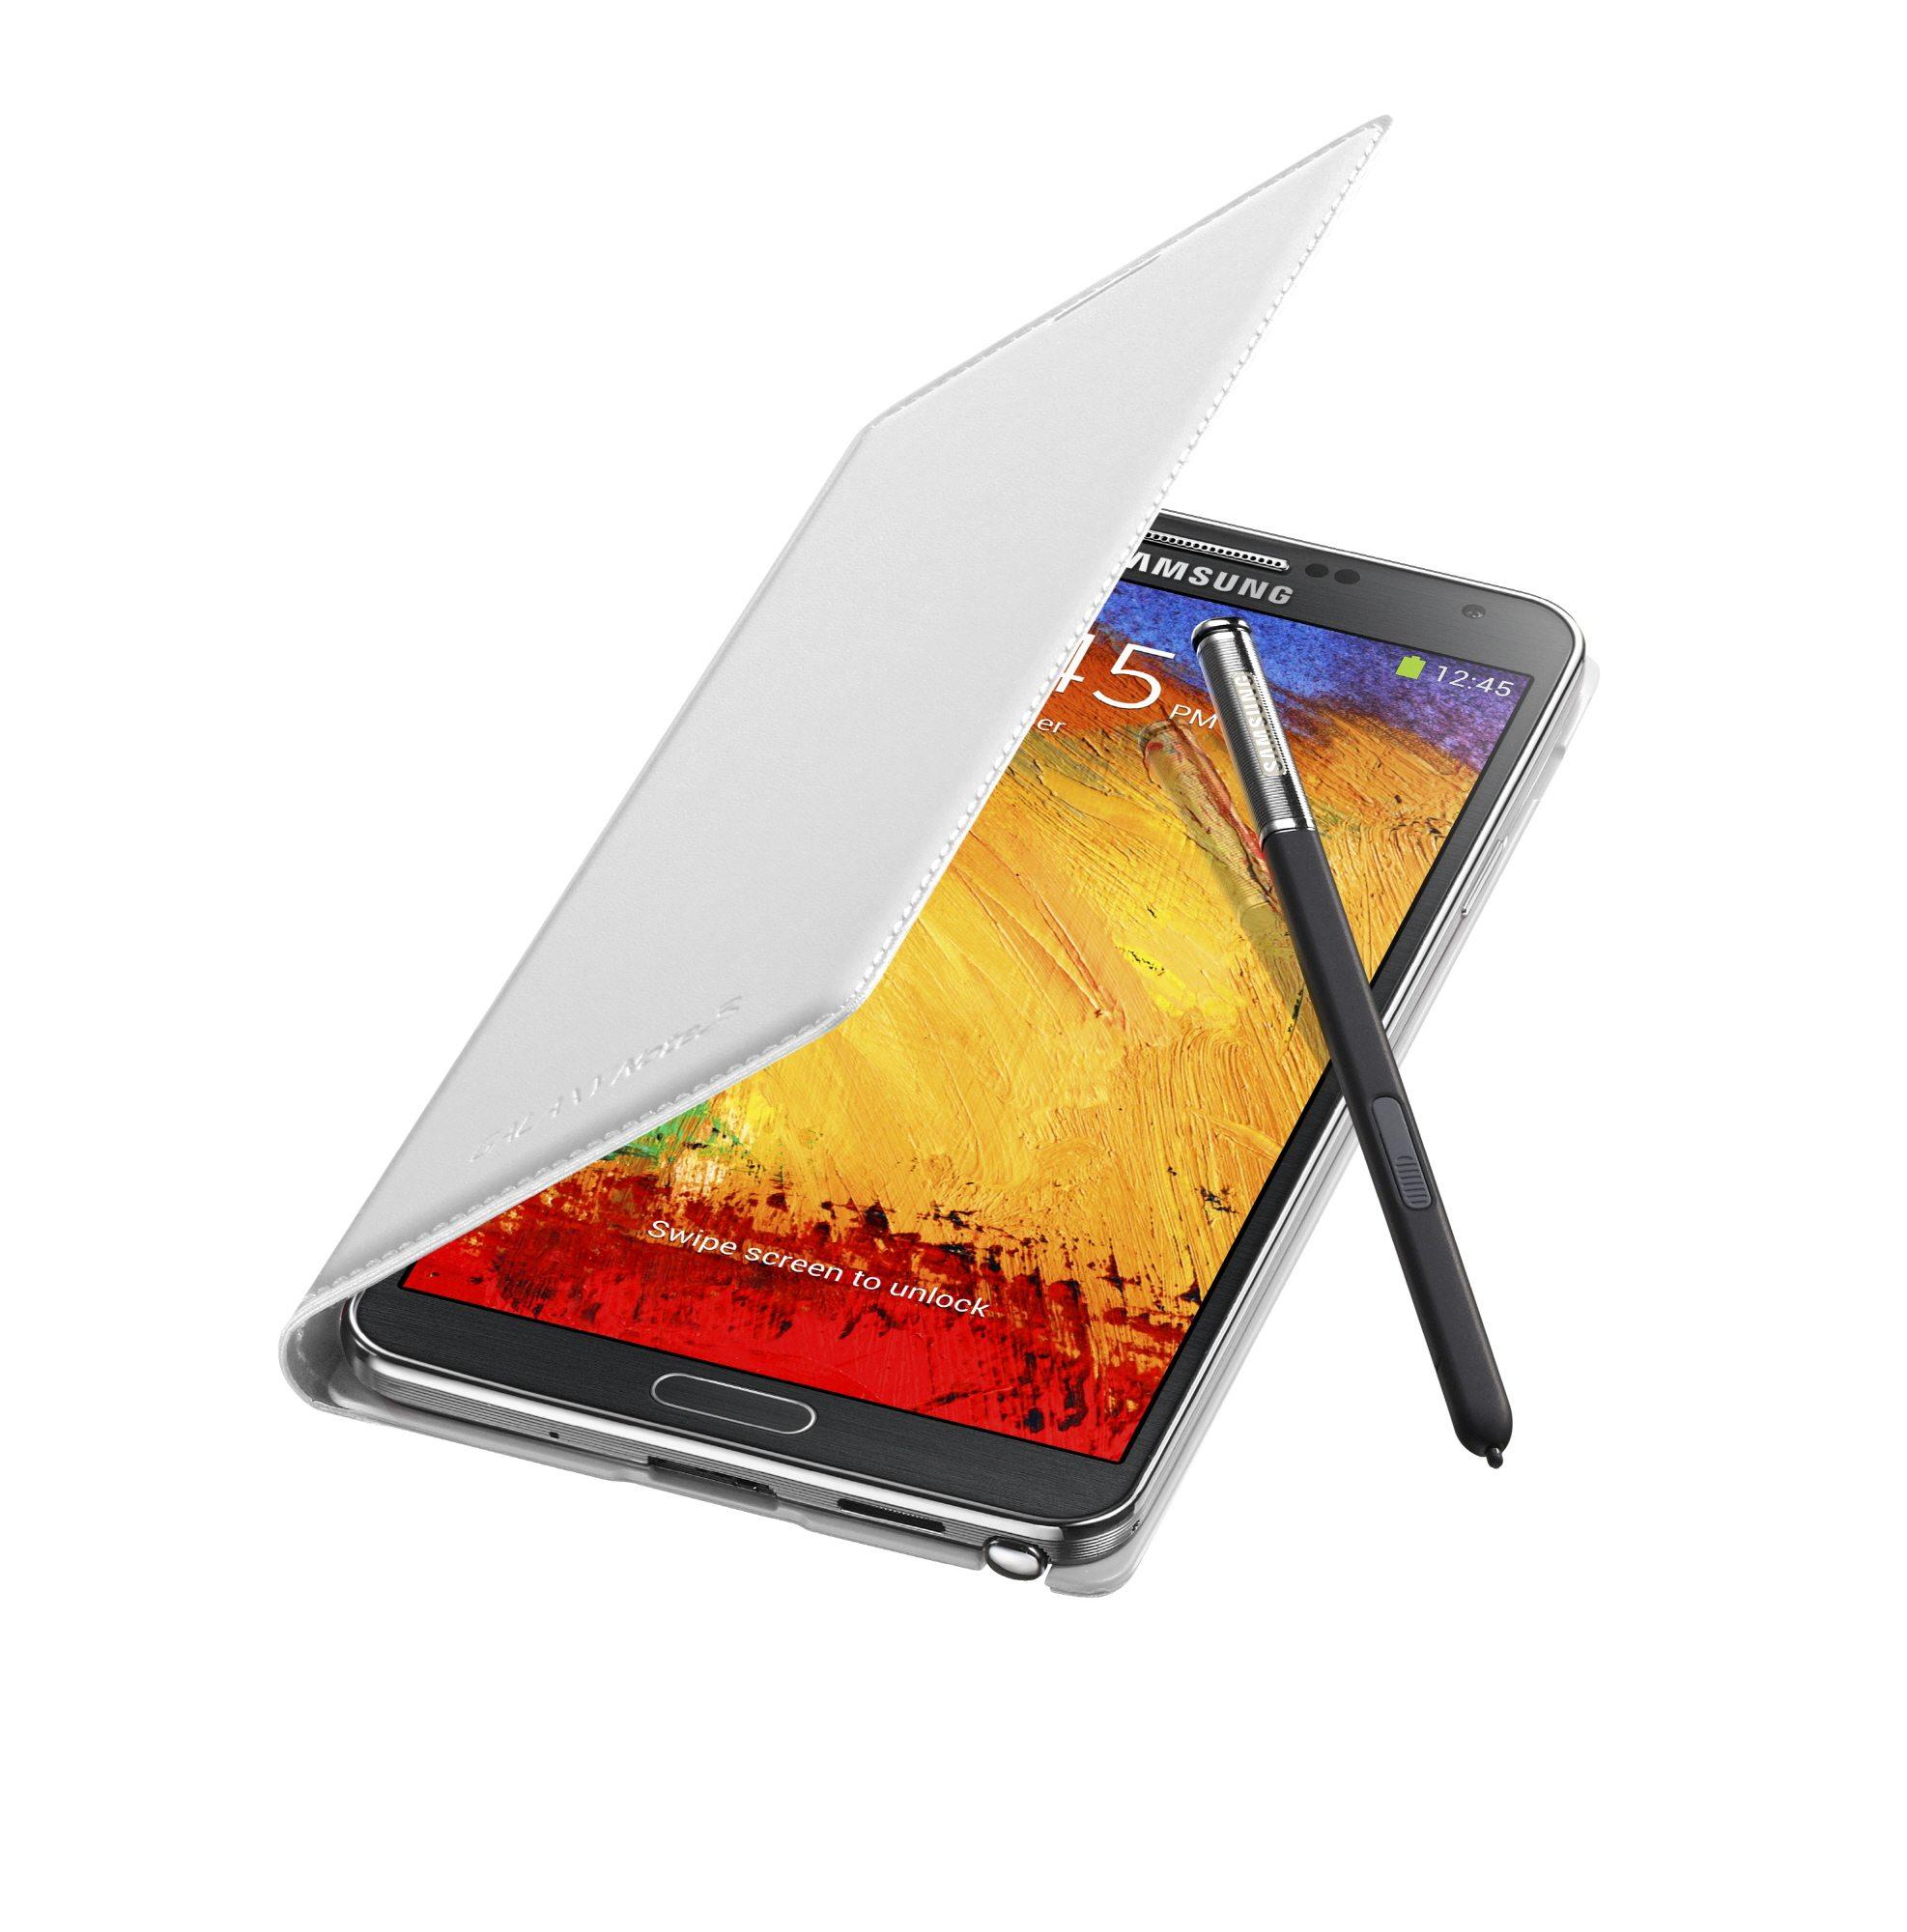 Galaxy-Note3-FlipCover_004_Open-Pen_Classic-White